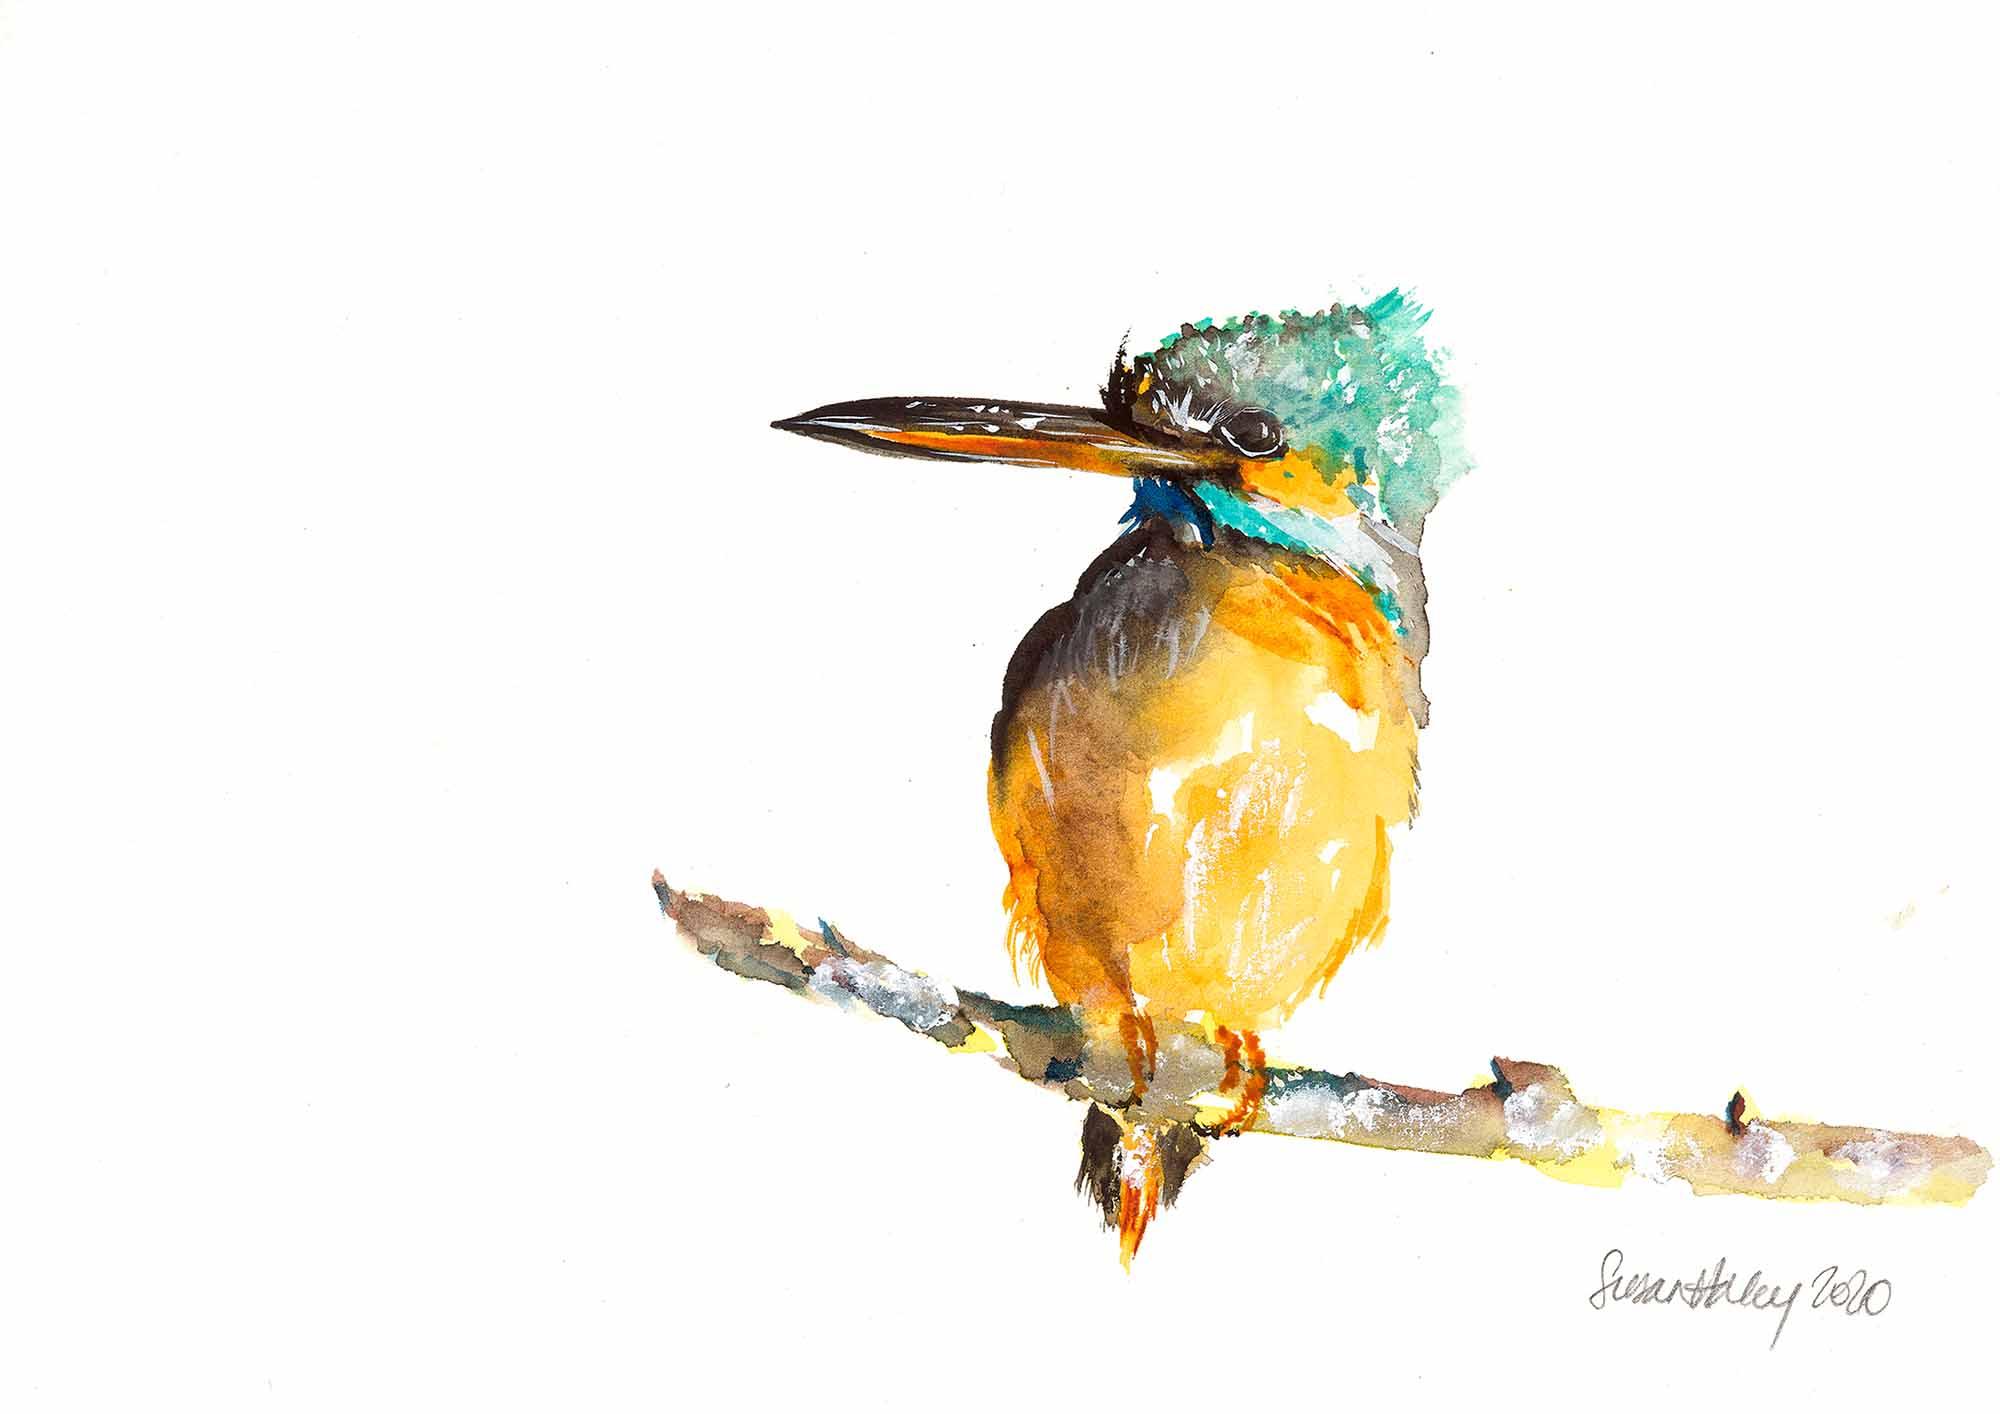 Susan haley 005 kingfisher 2000px nx8329